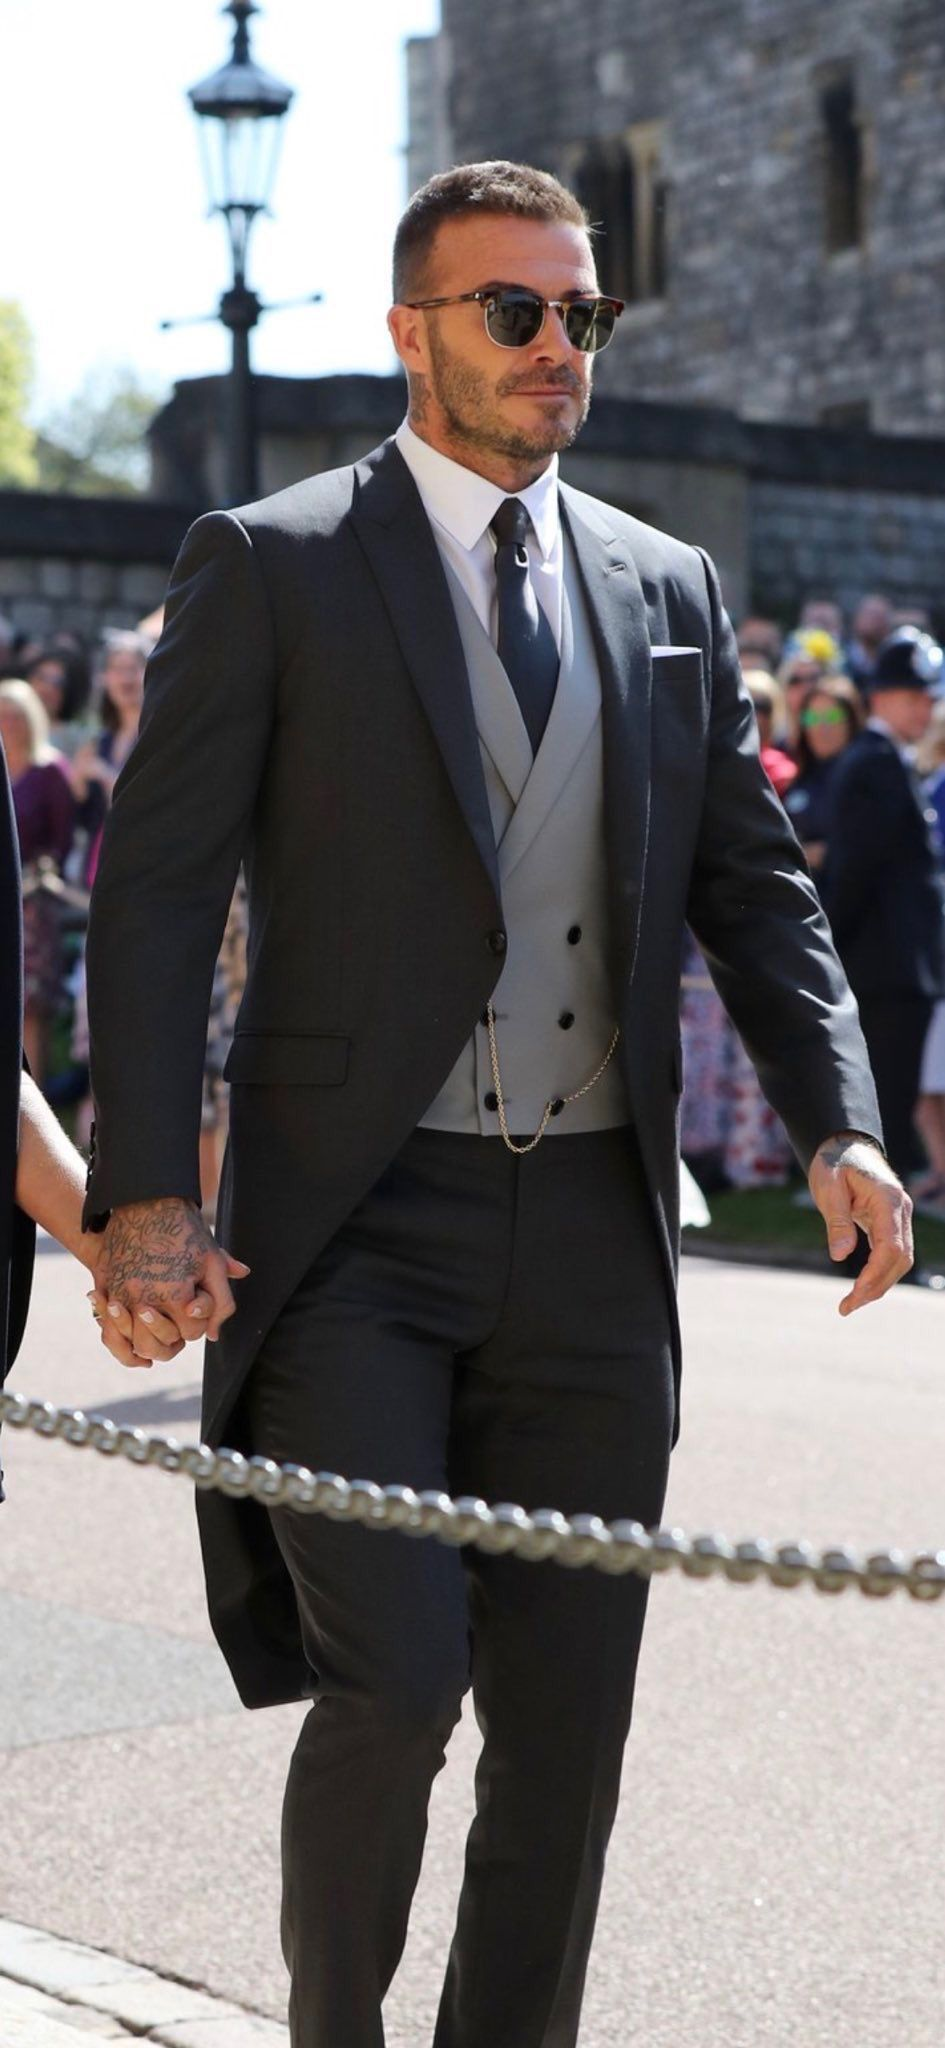 David Beckham Haircut Royal Wedding